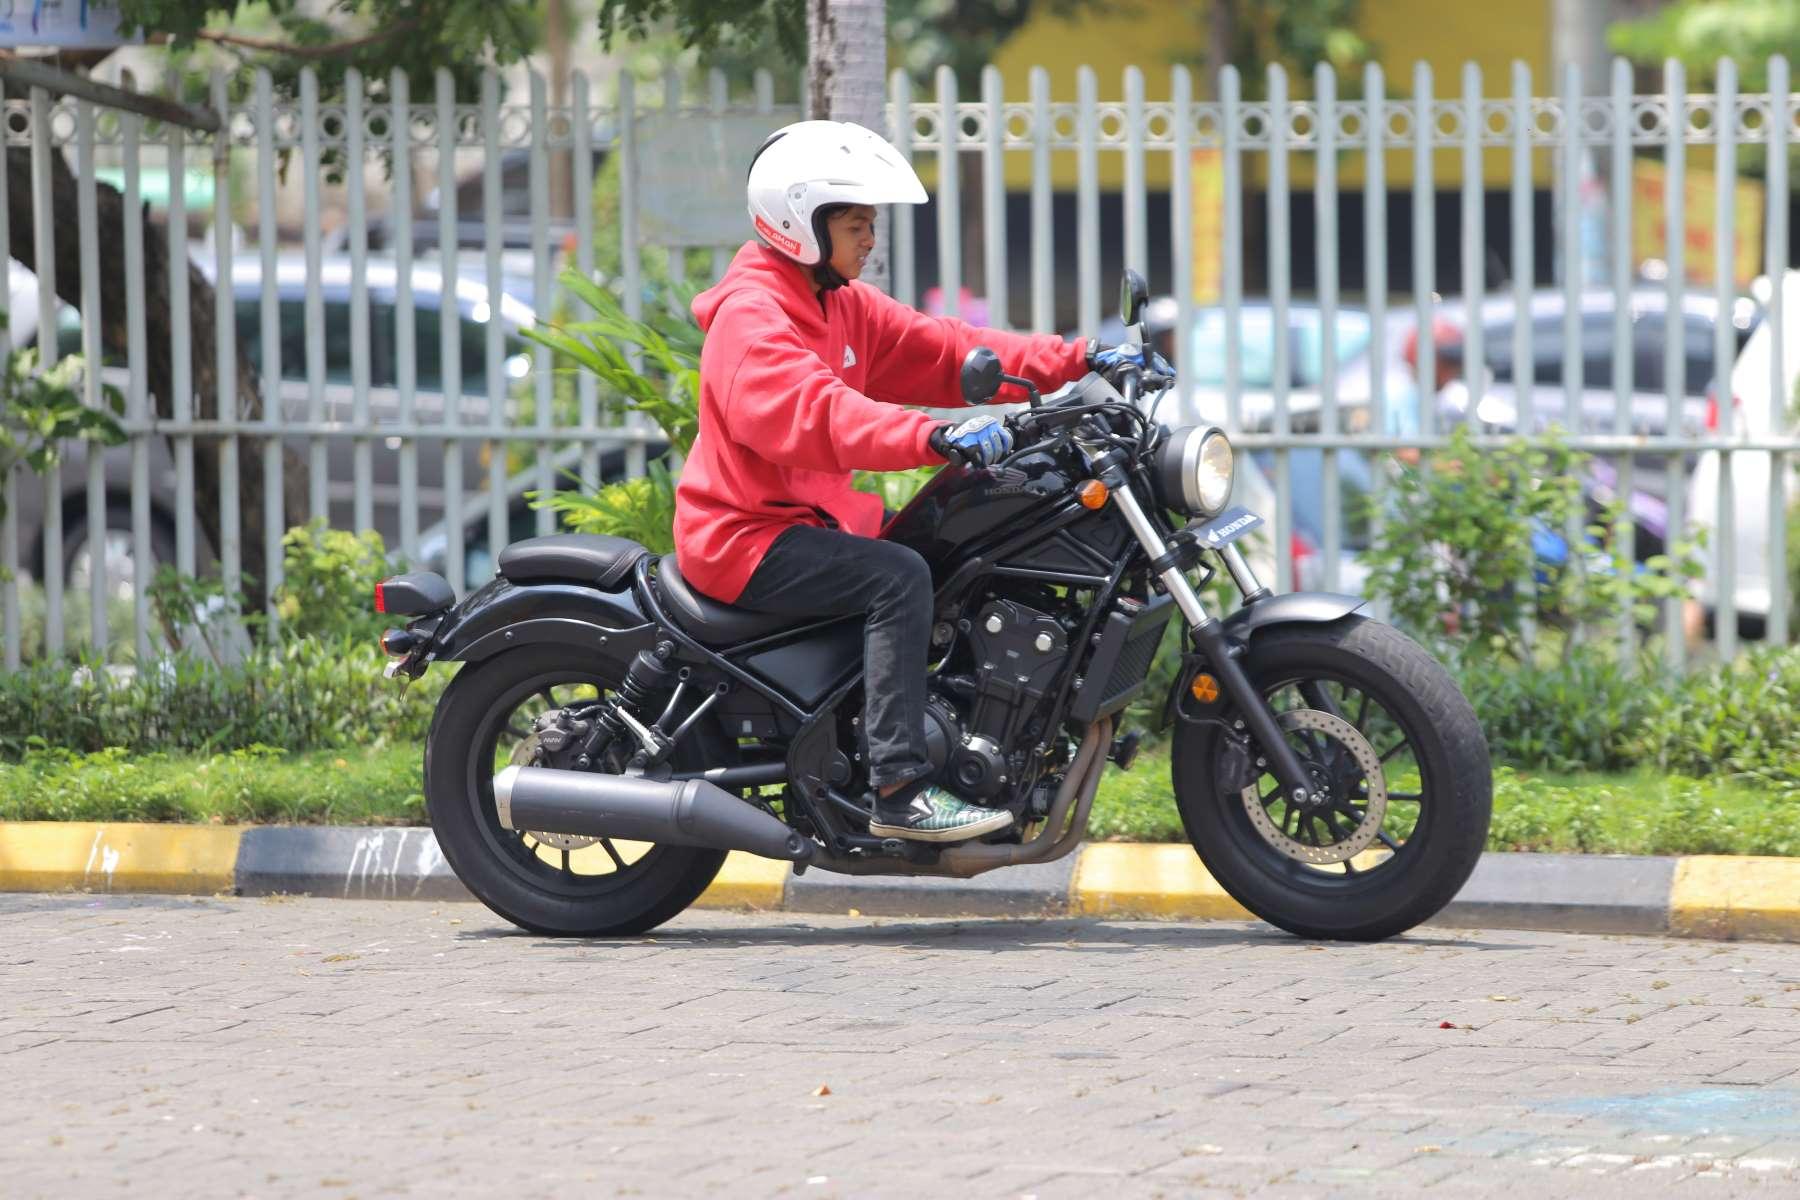 Habis Beli Motor Baru di GIIAS Surabaya 2020, Jangan Lupa Cek Ini